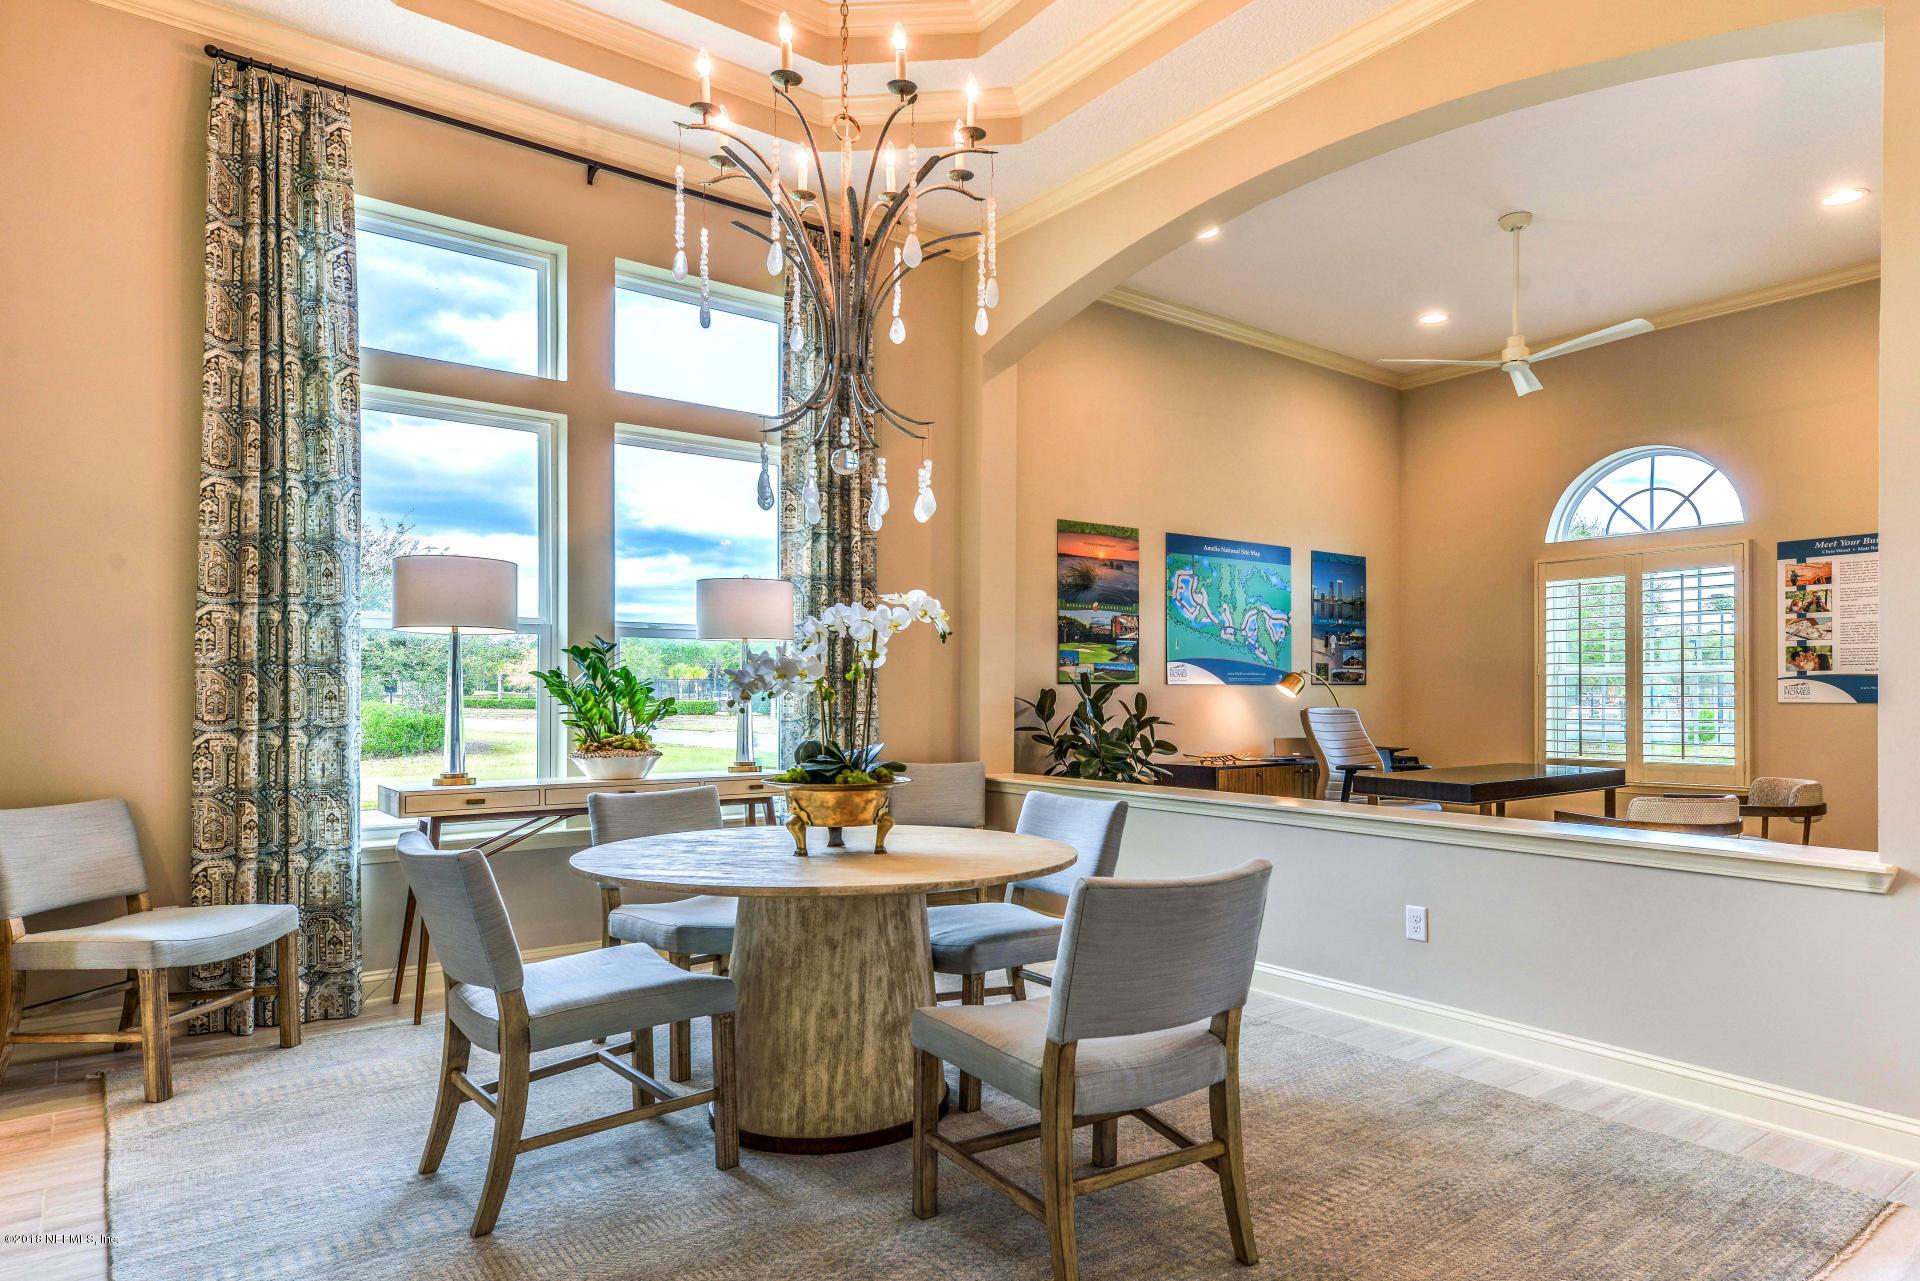 95143 POPLAR, FERNANDINA BEACH, FLORIDA 32034, 3 Bedrooms Bedrooms, ,2 BathroomsBathrooms,Residential - single family,For sale,POPLAR,959178